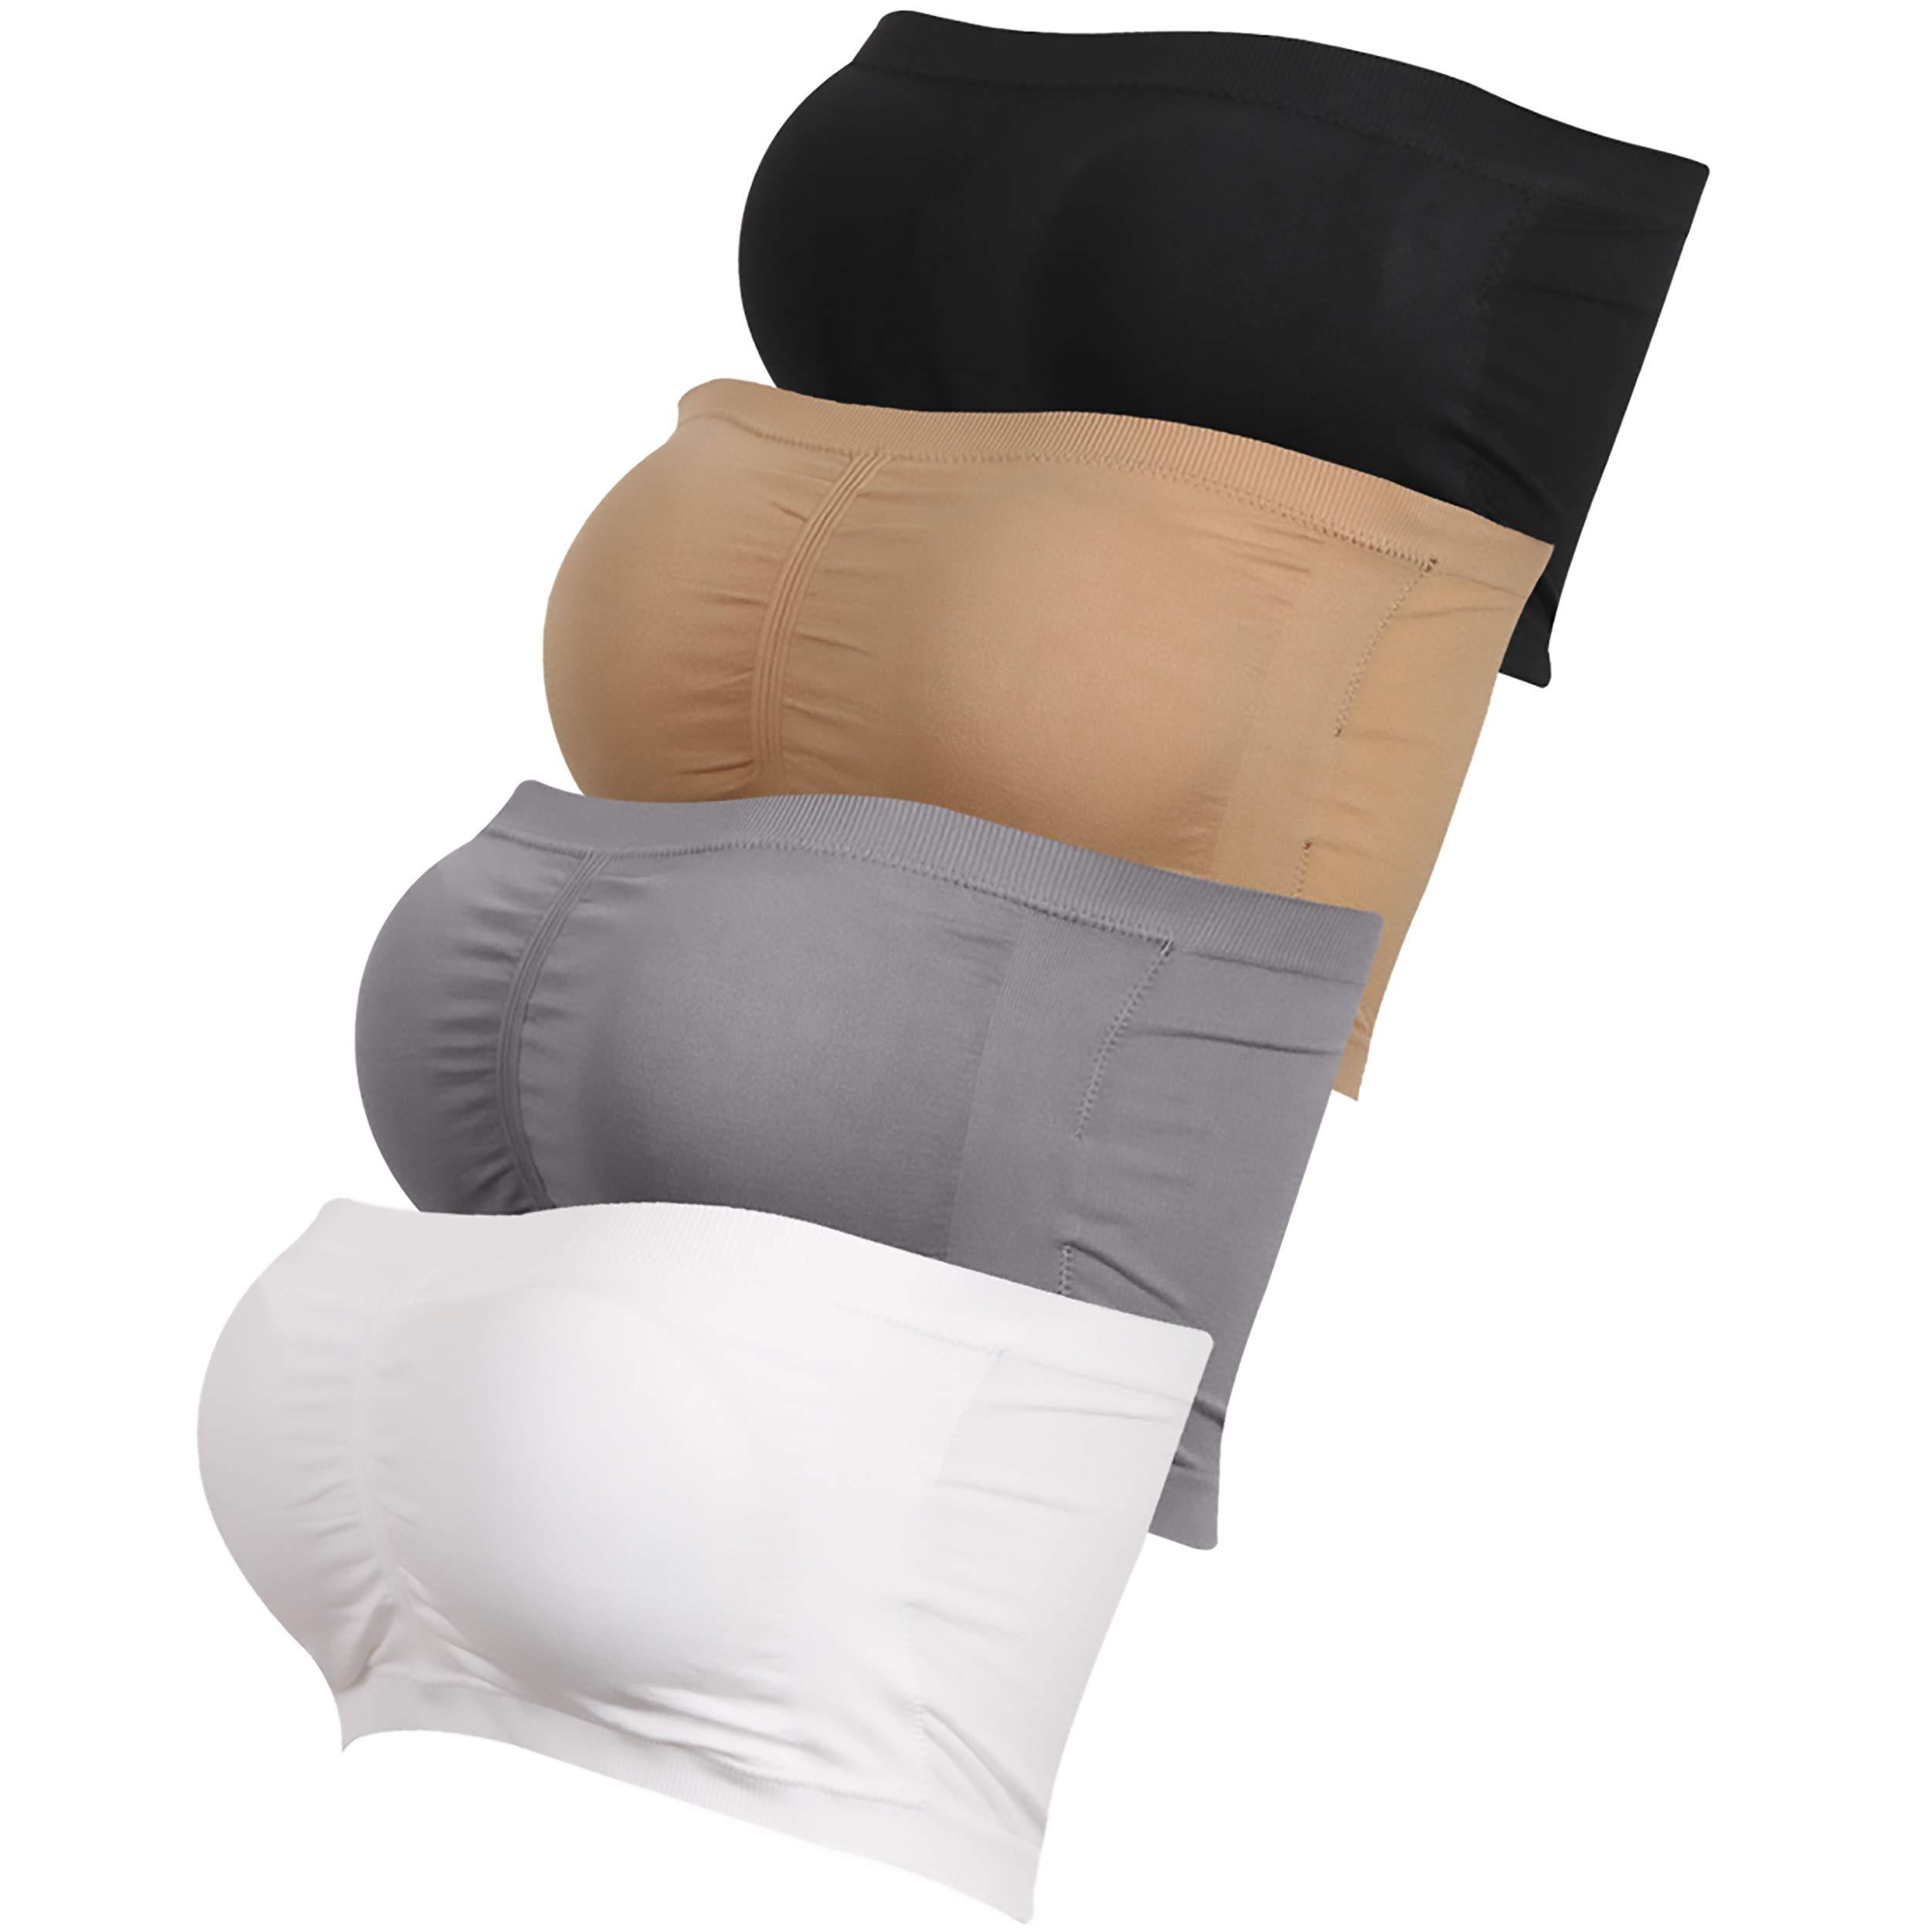 saillsen Women's Seamless Padded Bandeau, Basic Layering Strapless Tube Top Bra Stretch Bralette 1-4 Packs